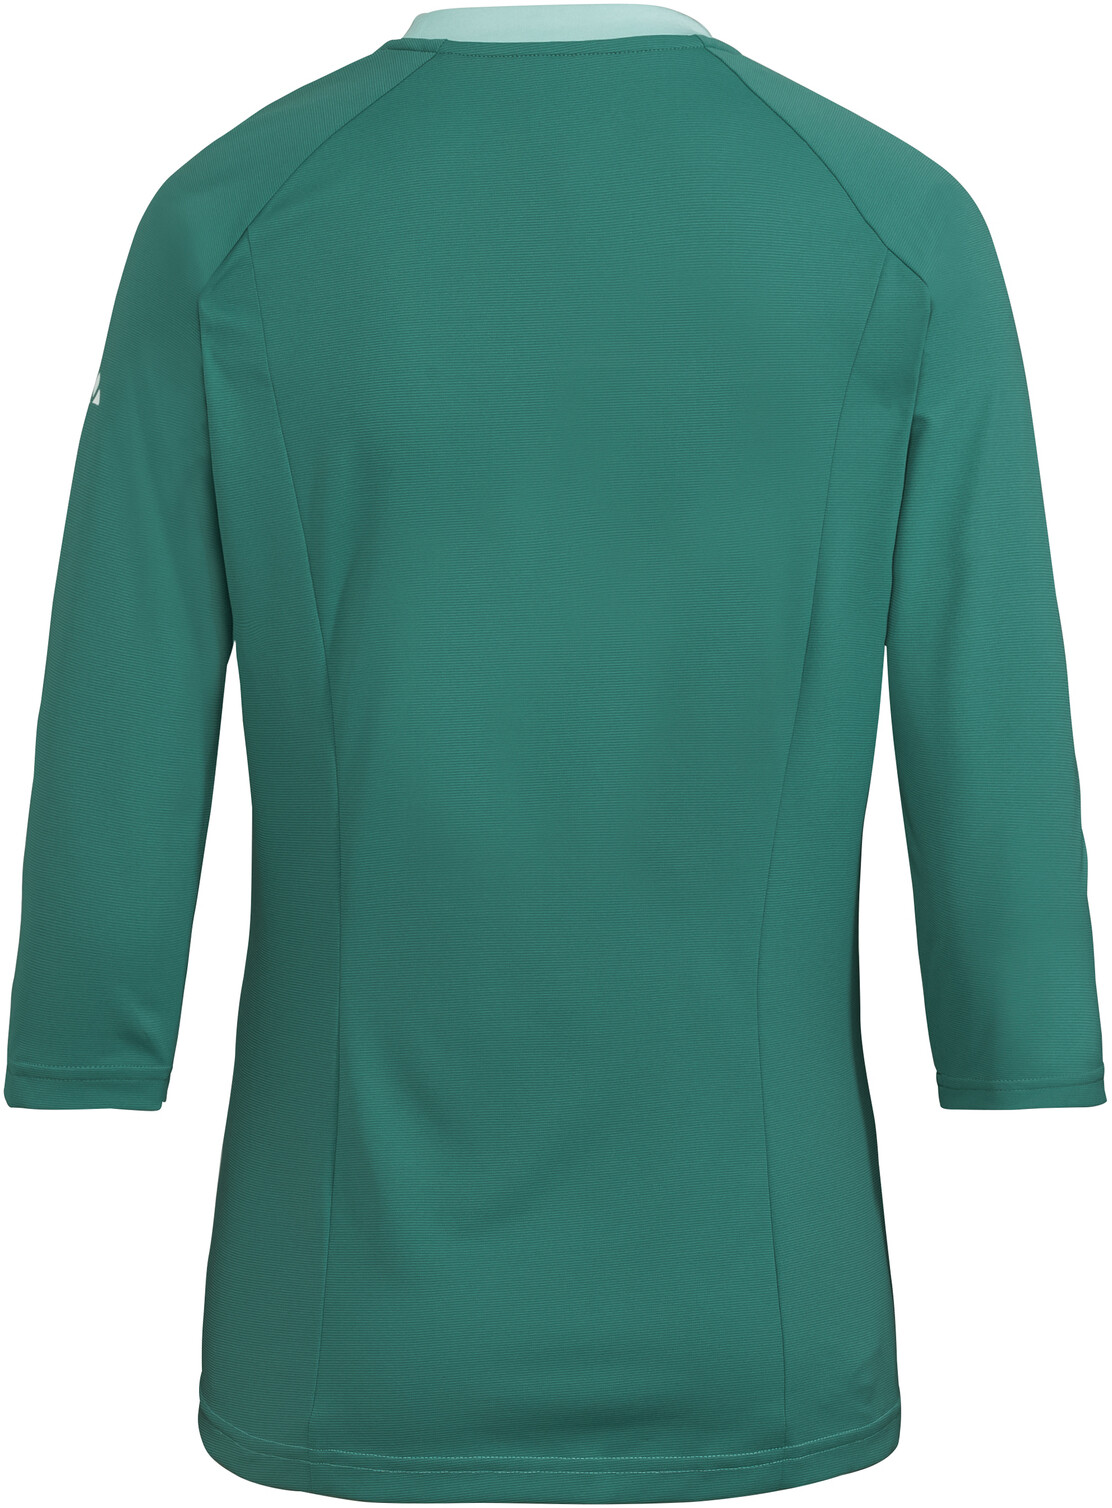 c6fe04df8386b4 VAUDE Moab III maglietta a maniche lunghe Donna verde su Bikester